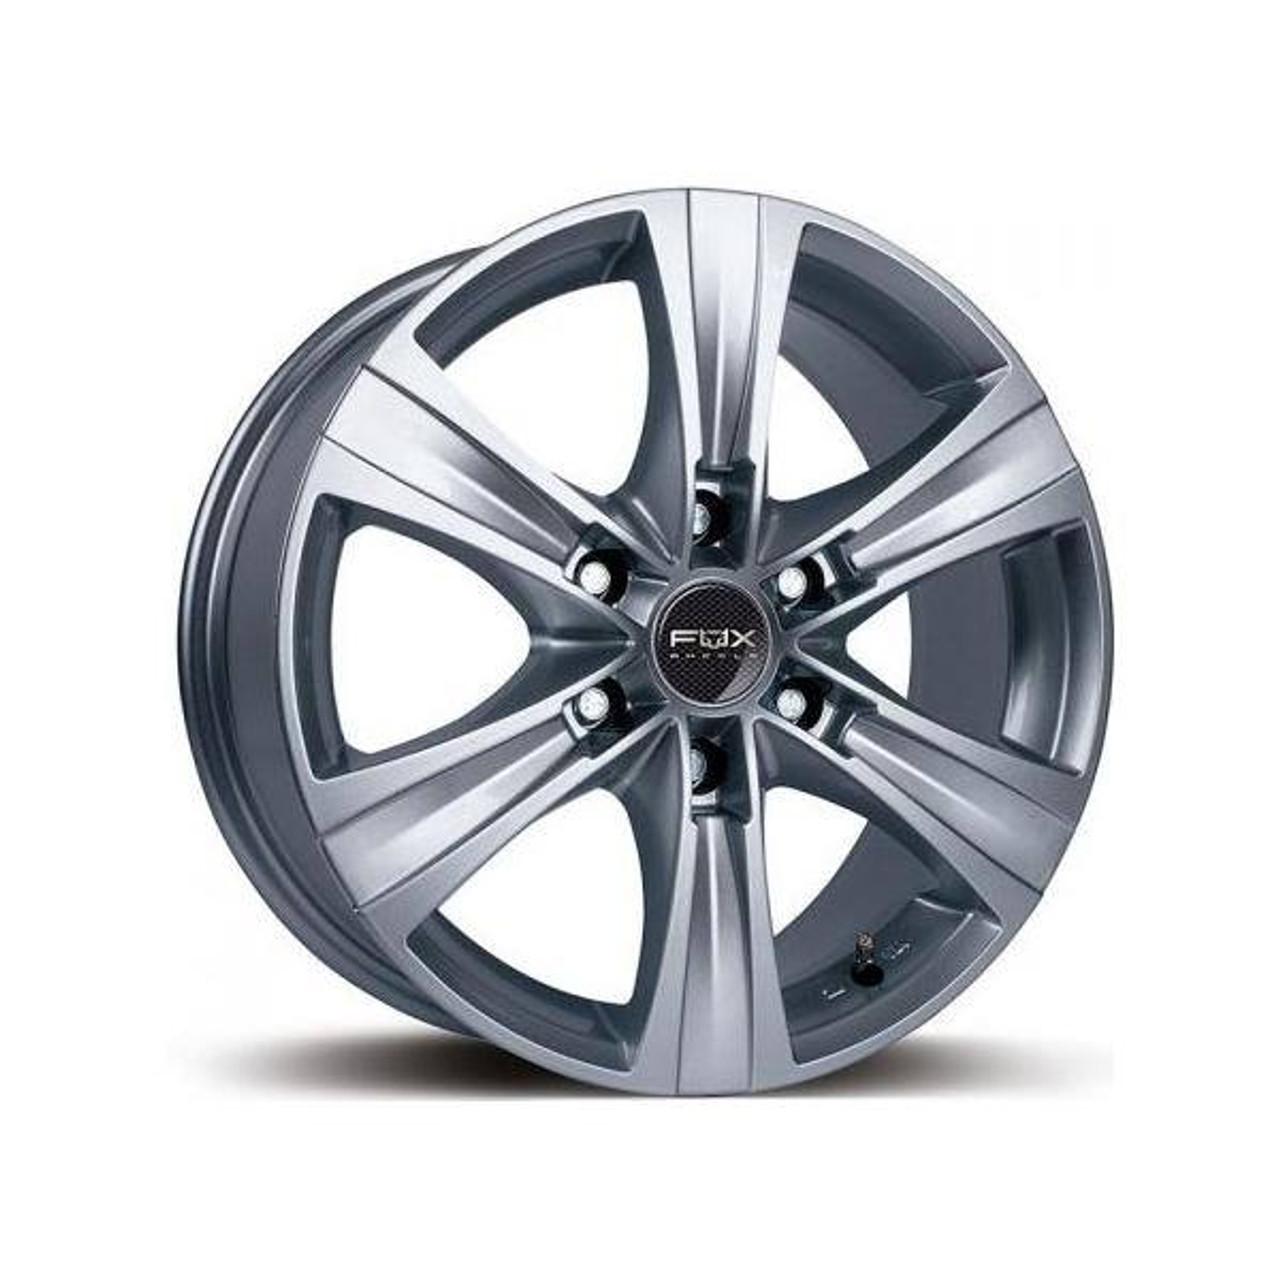 FOX Viper 3 Alloy Wheels Silver